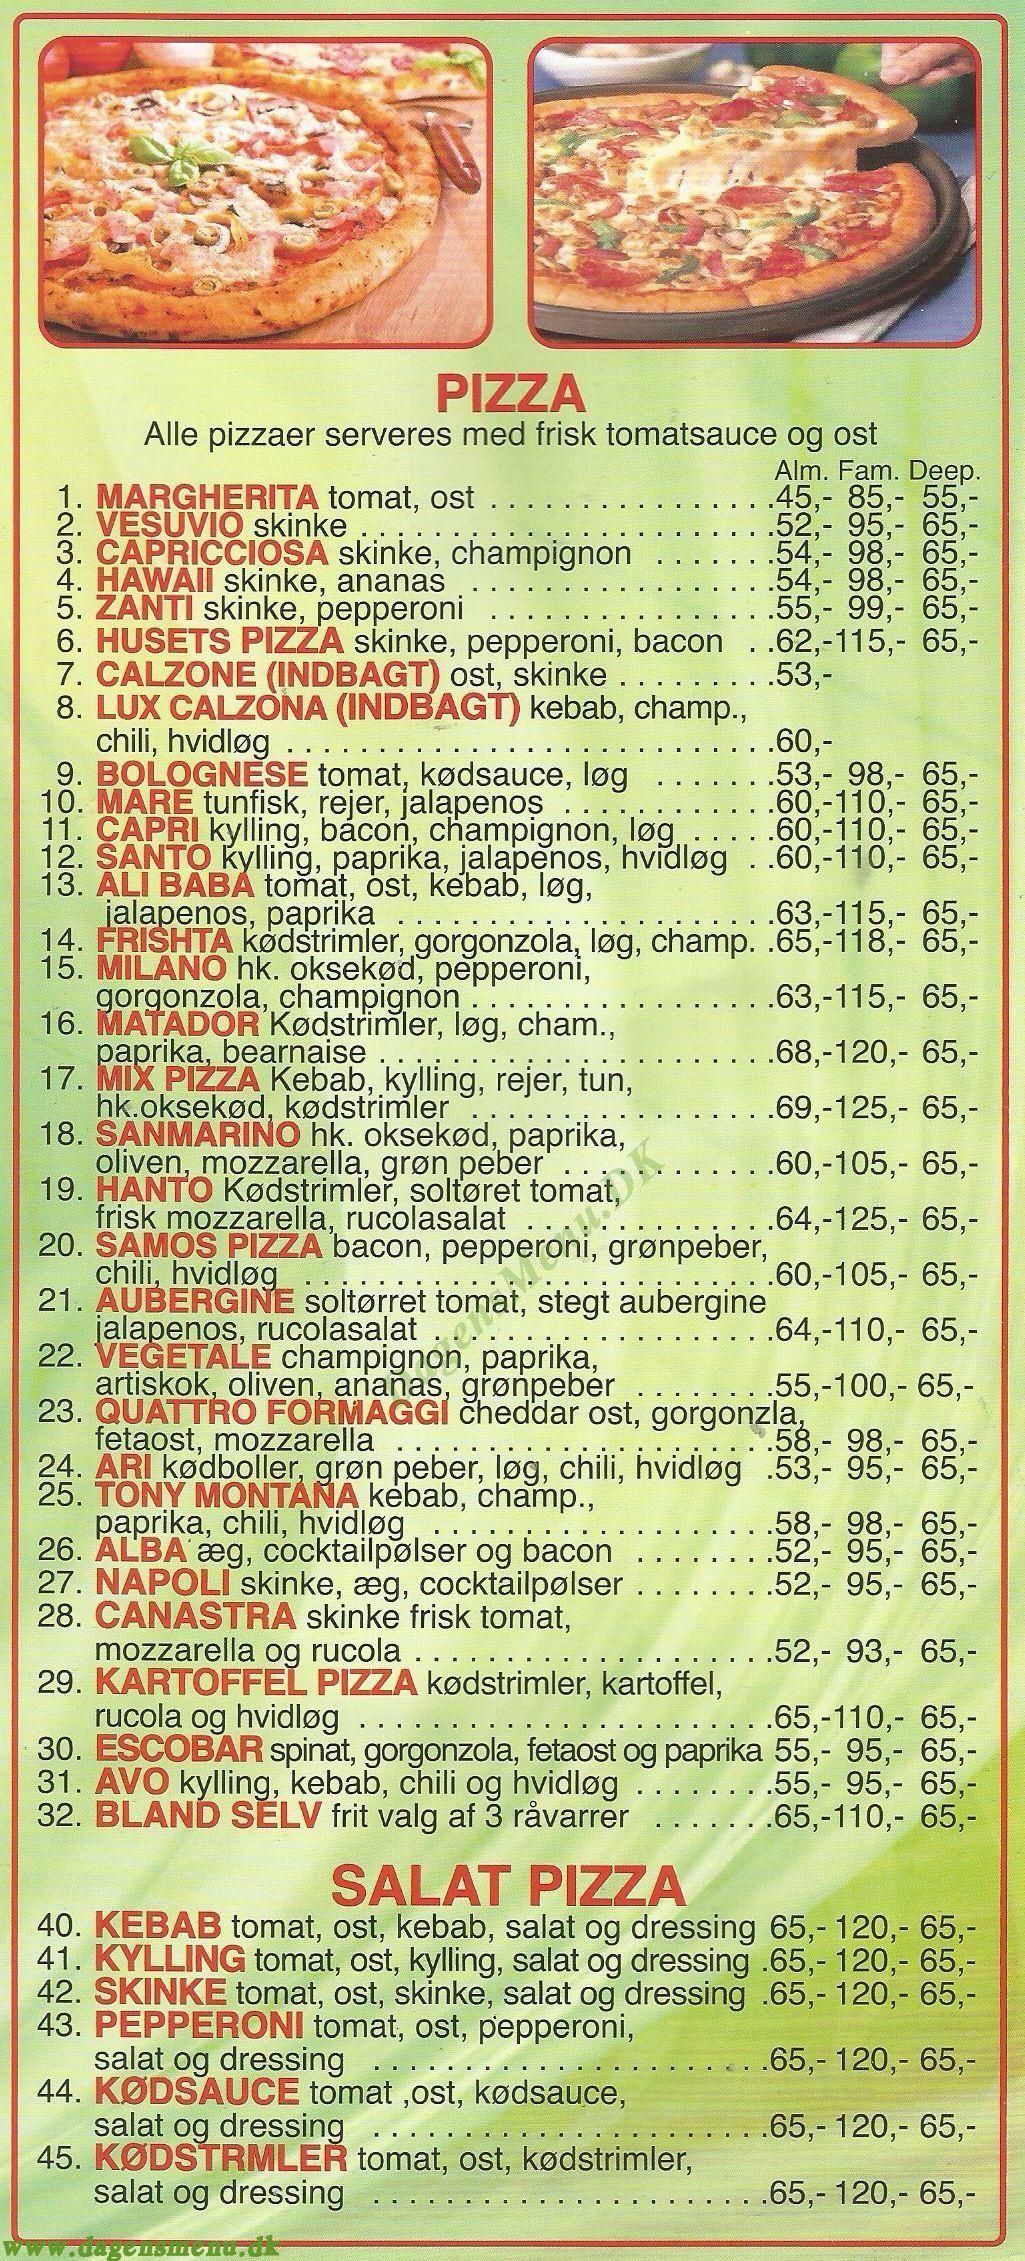 Milano Pizza - Menukort